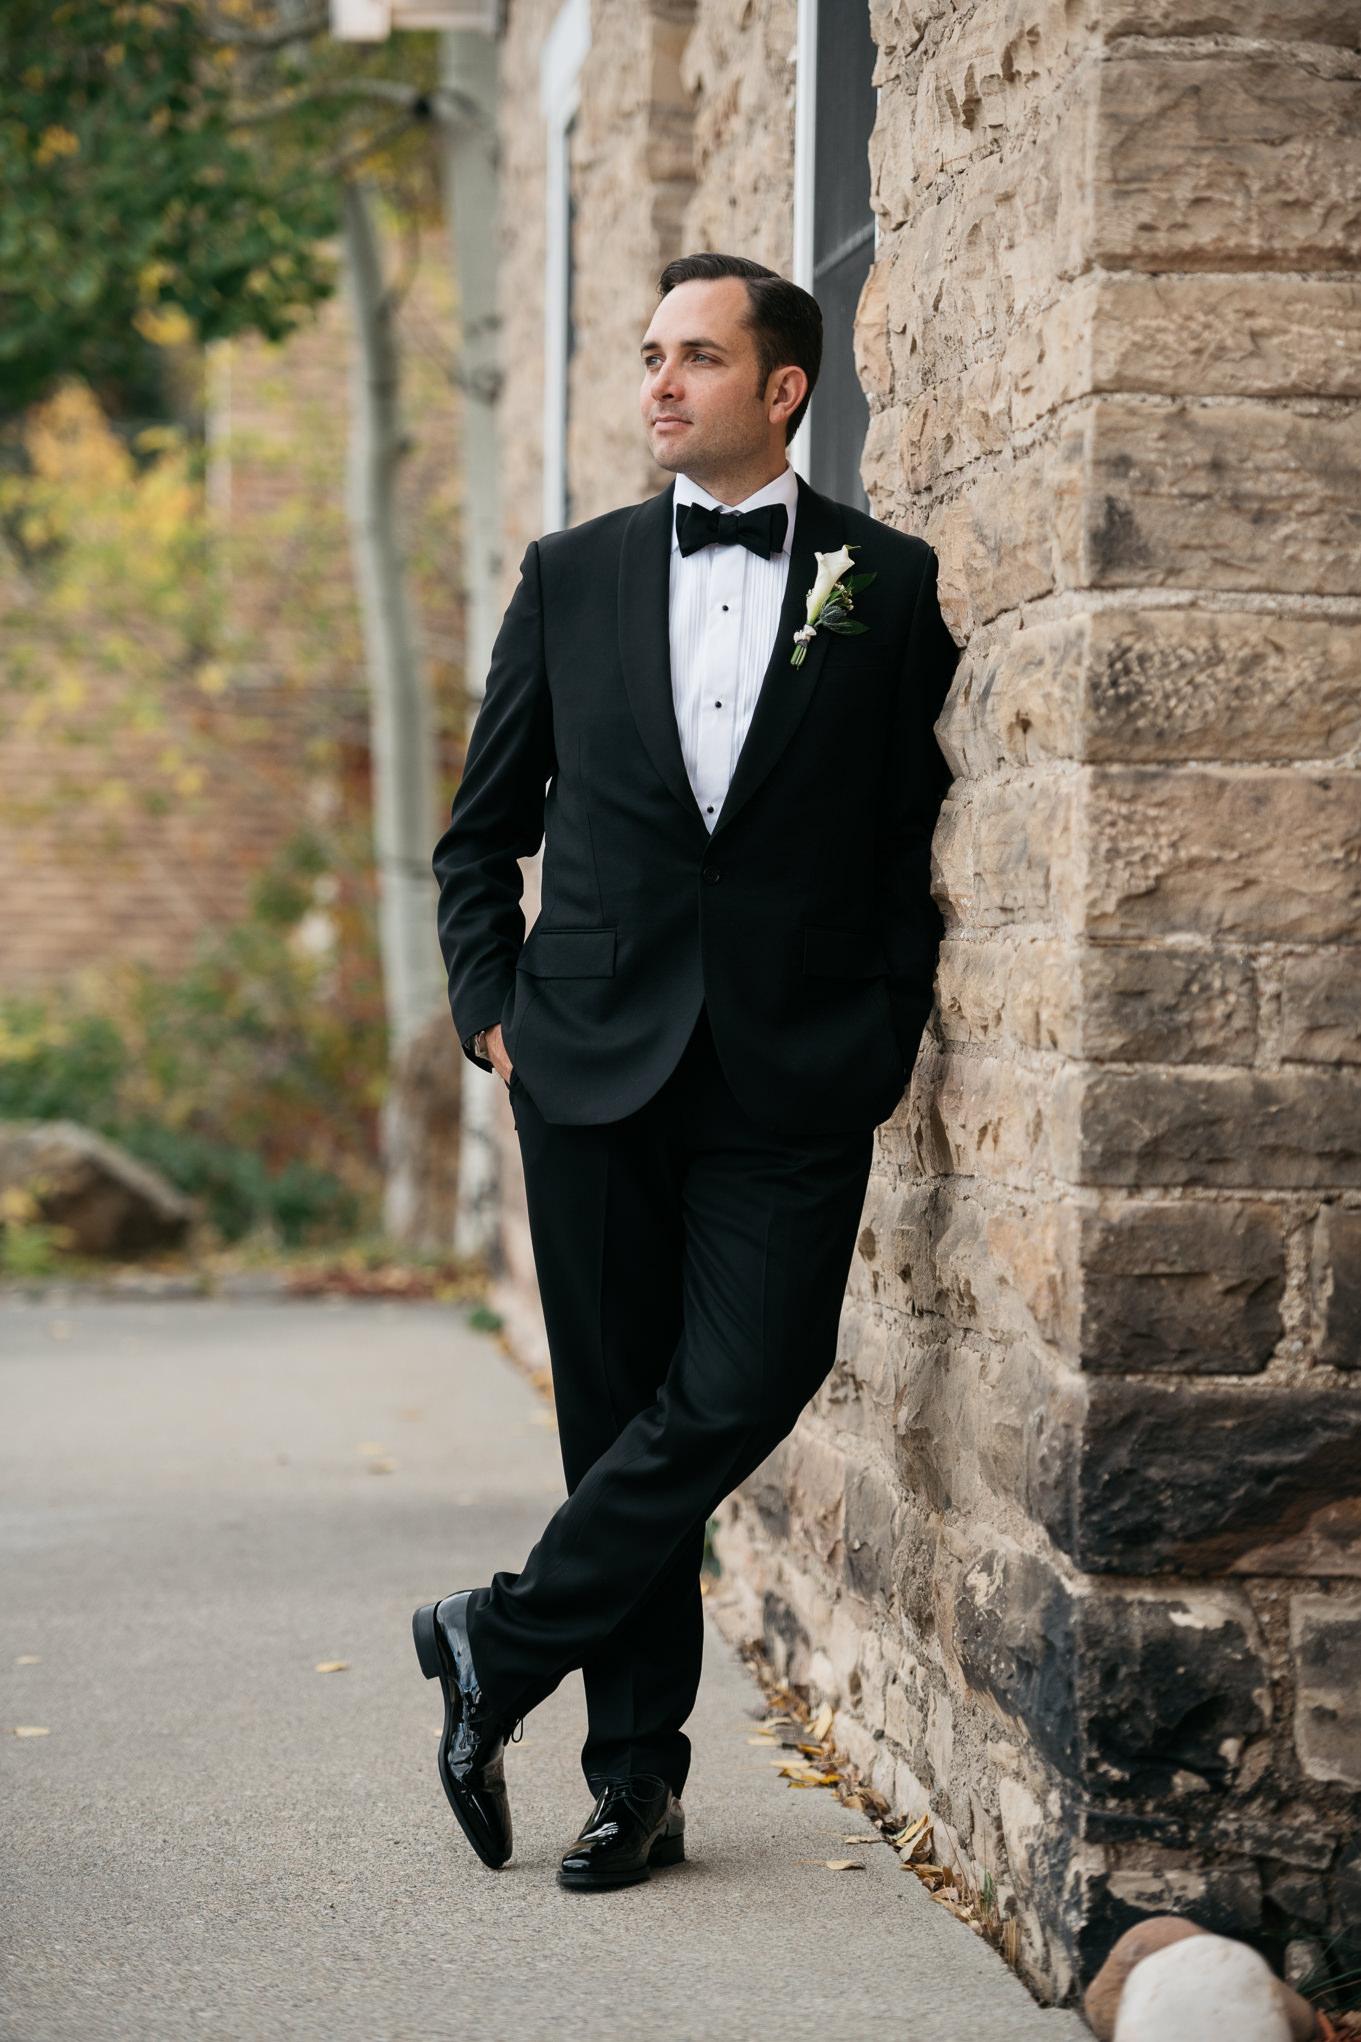 361_ONL_Mairin_Brian_Wedding_Trevor_Hooper_Photo.jpg